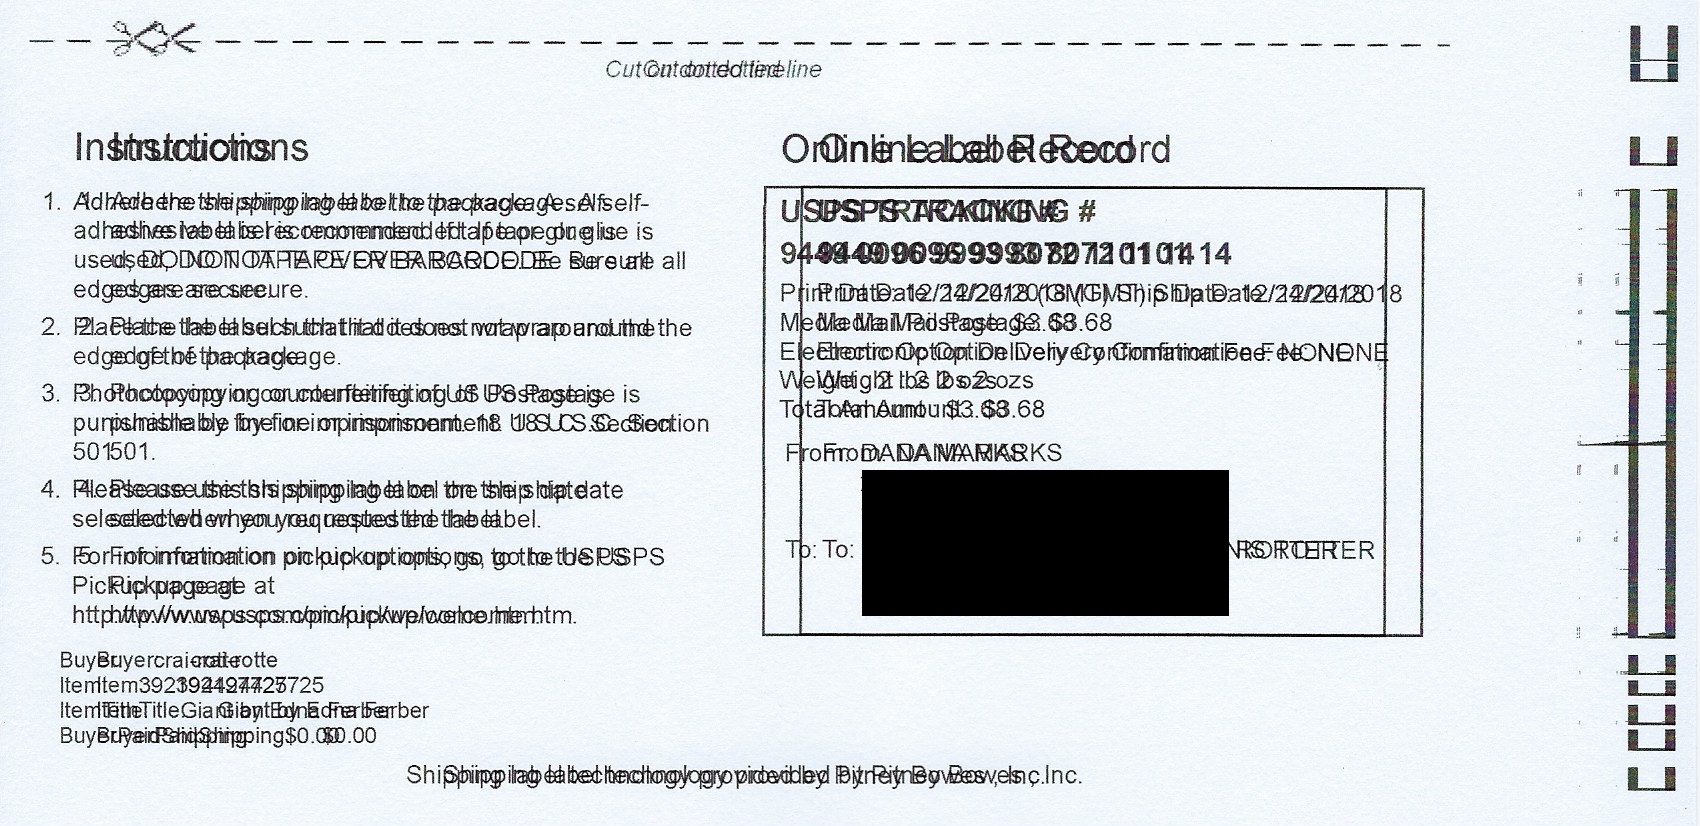 HP Officejet 8710 prints